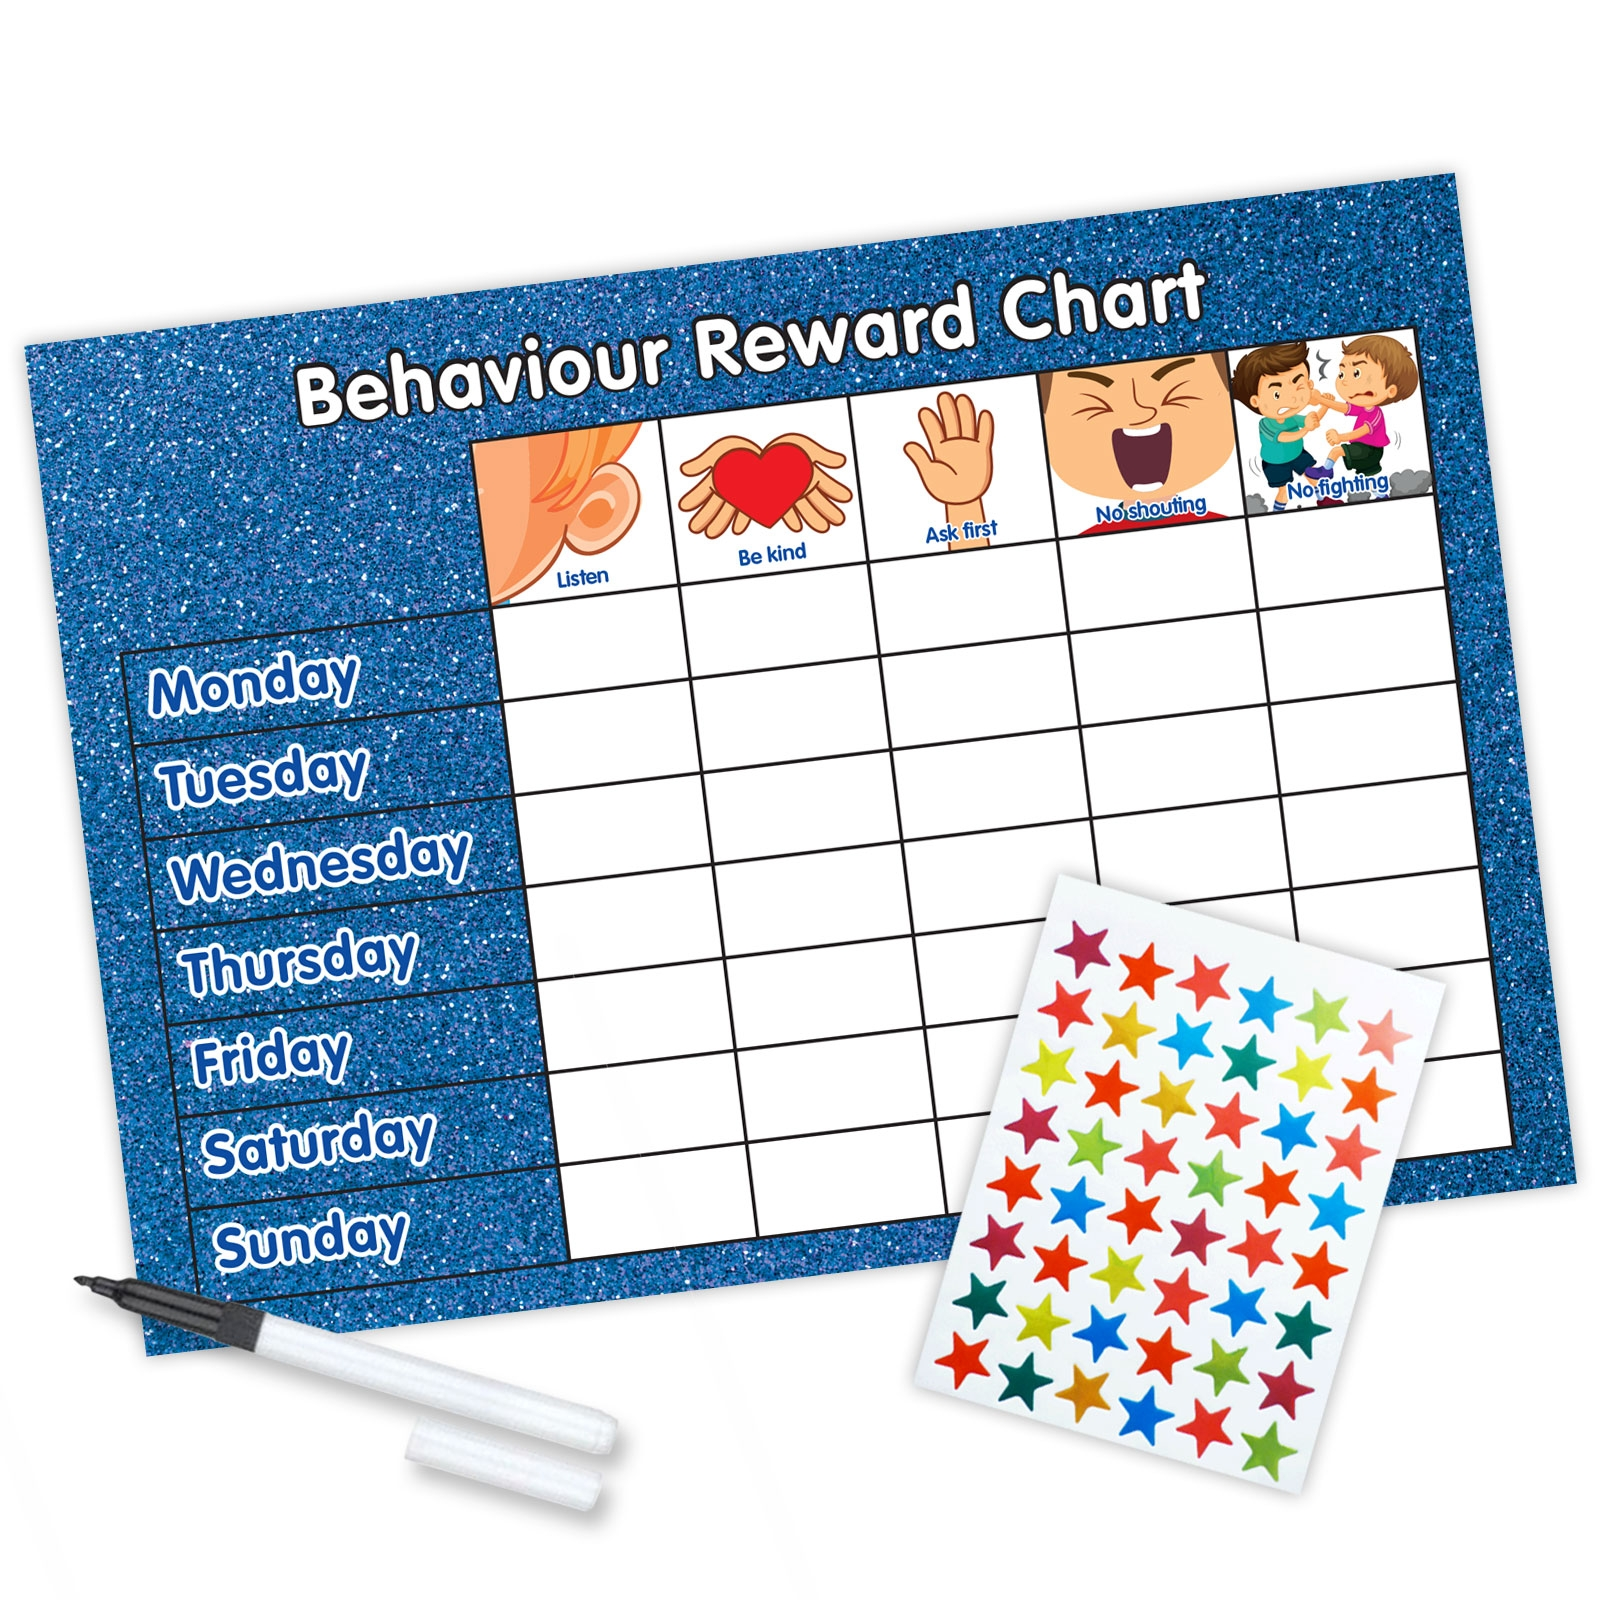 reward chart behaviour a4 blue glitter funky monkey house::Reward Chart with Sticker